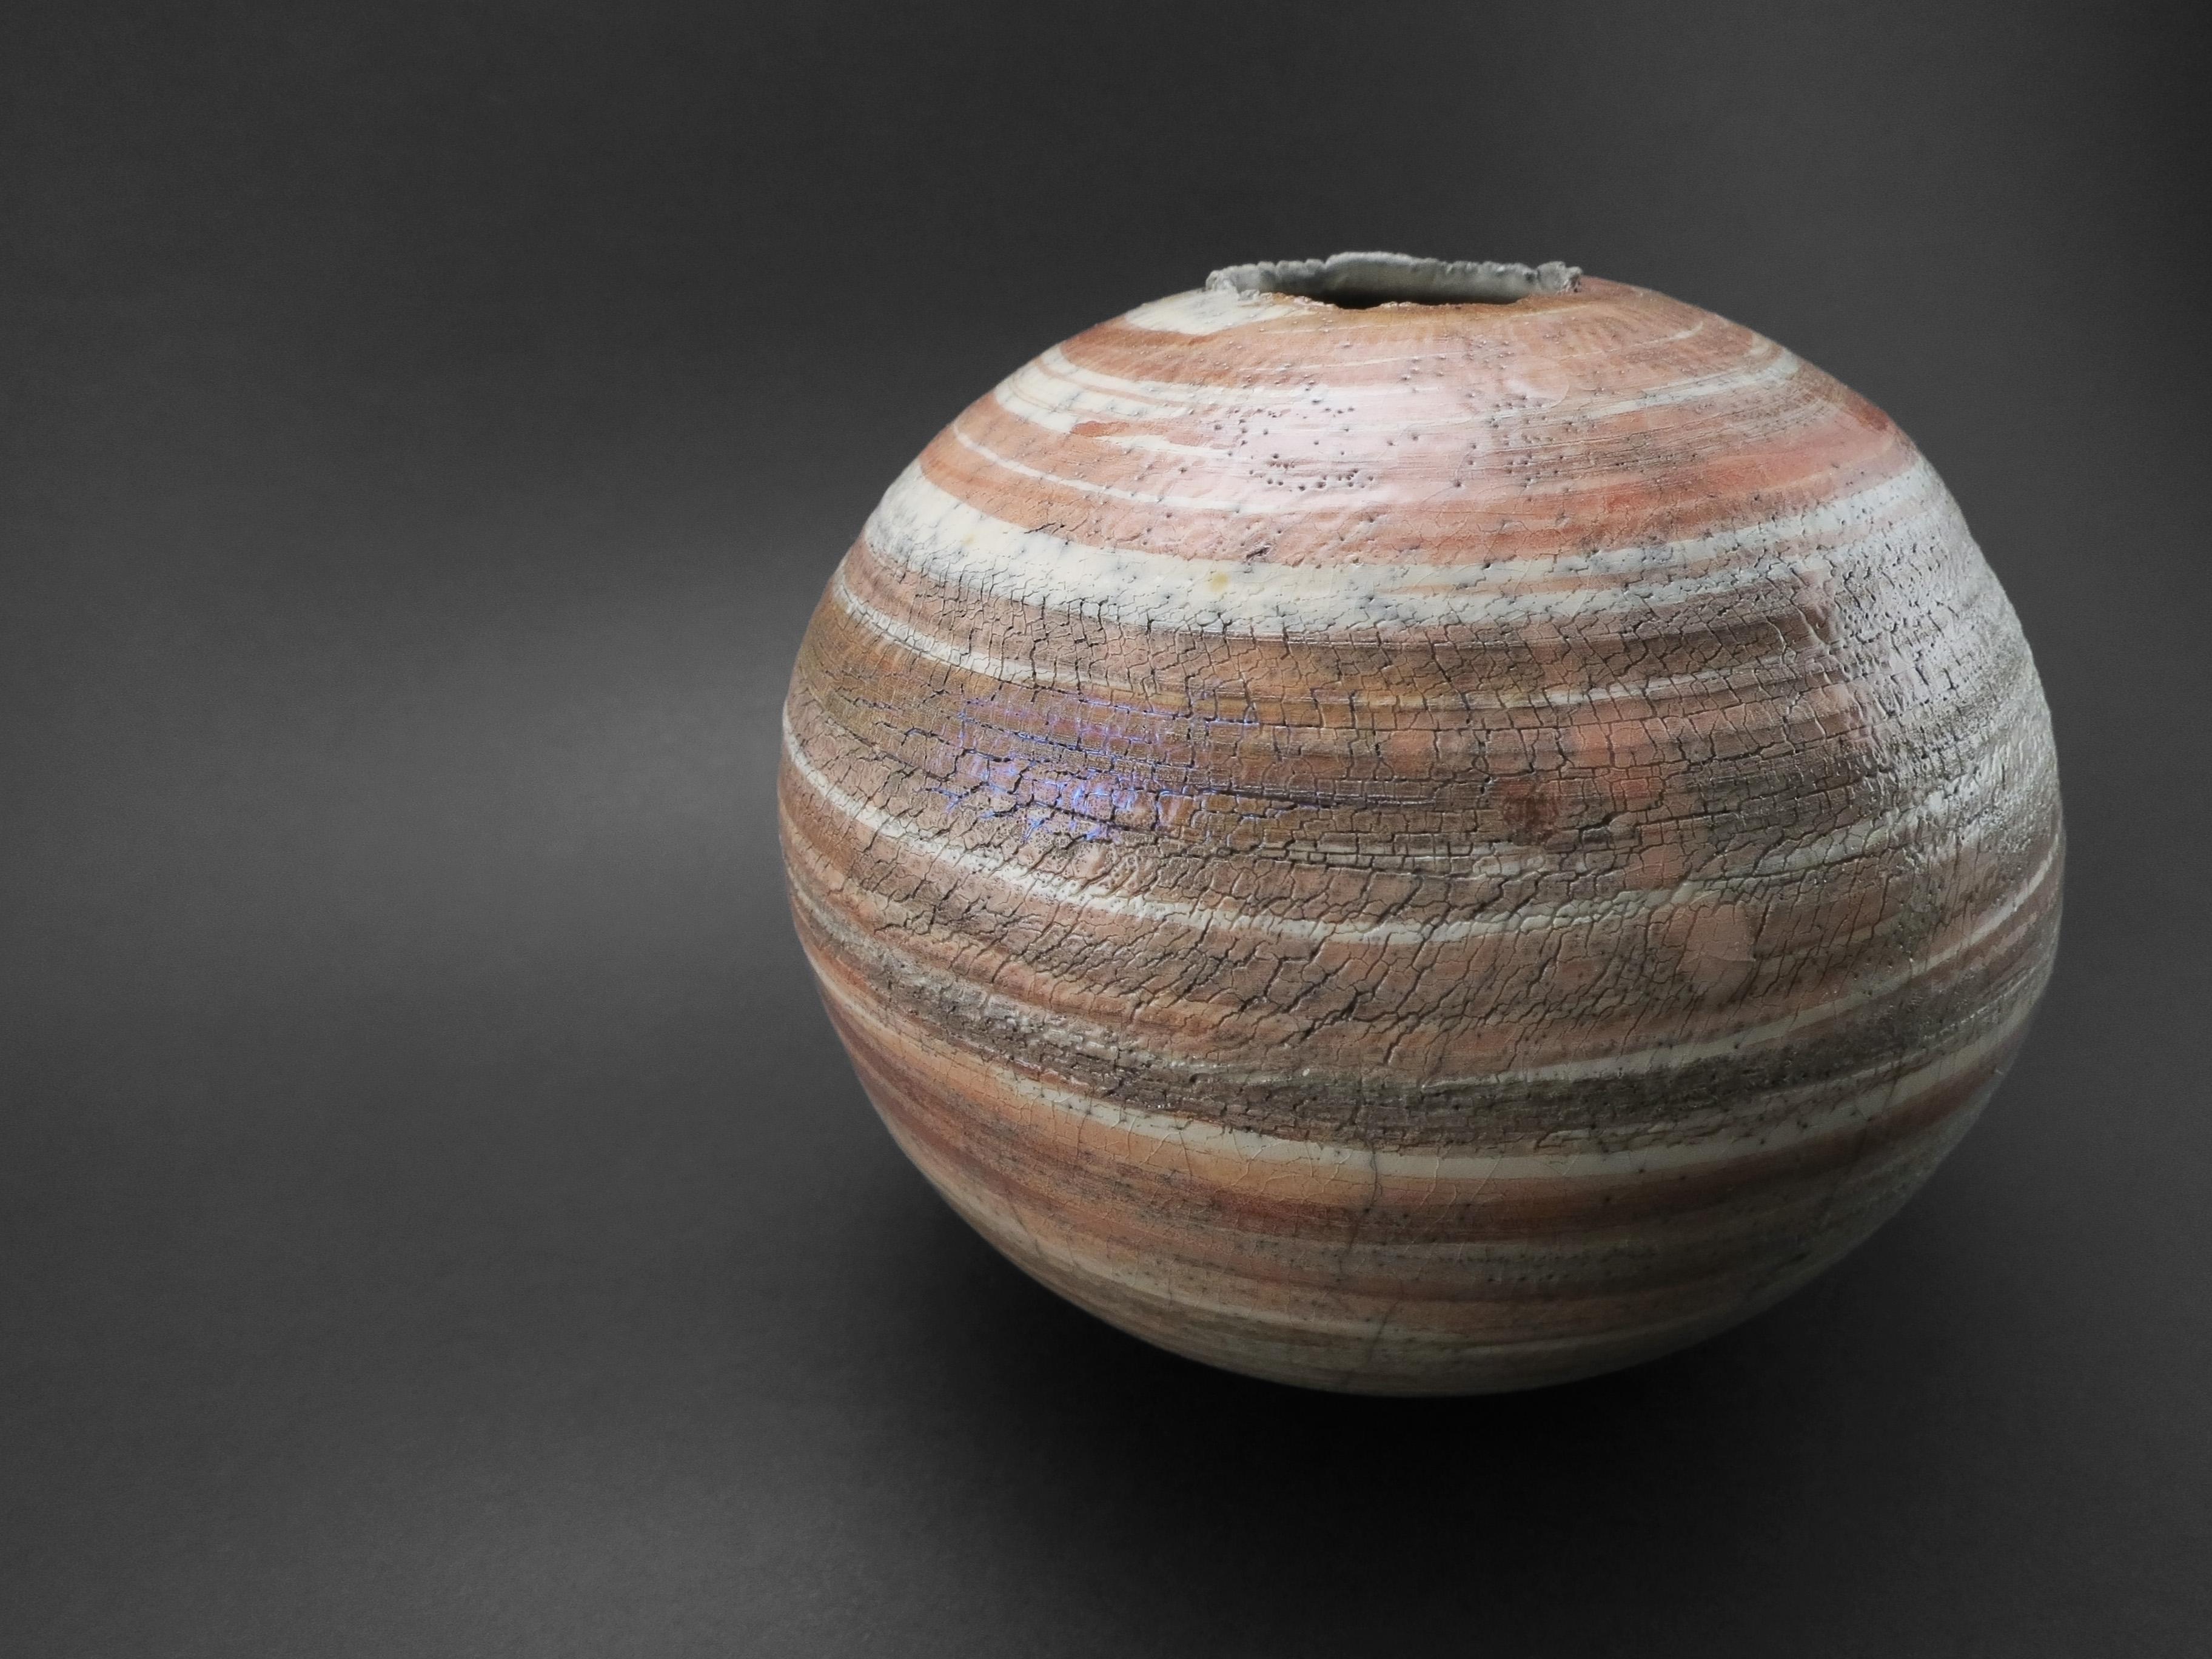 Super-Jupiter: Whispering Globe - Ildikó Károlyi